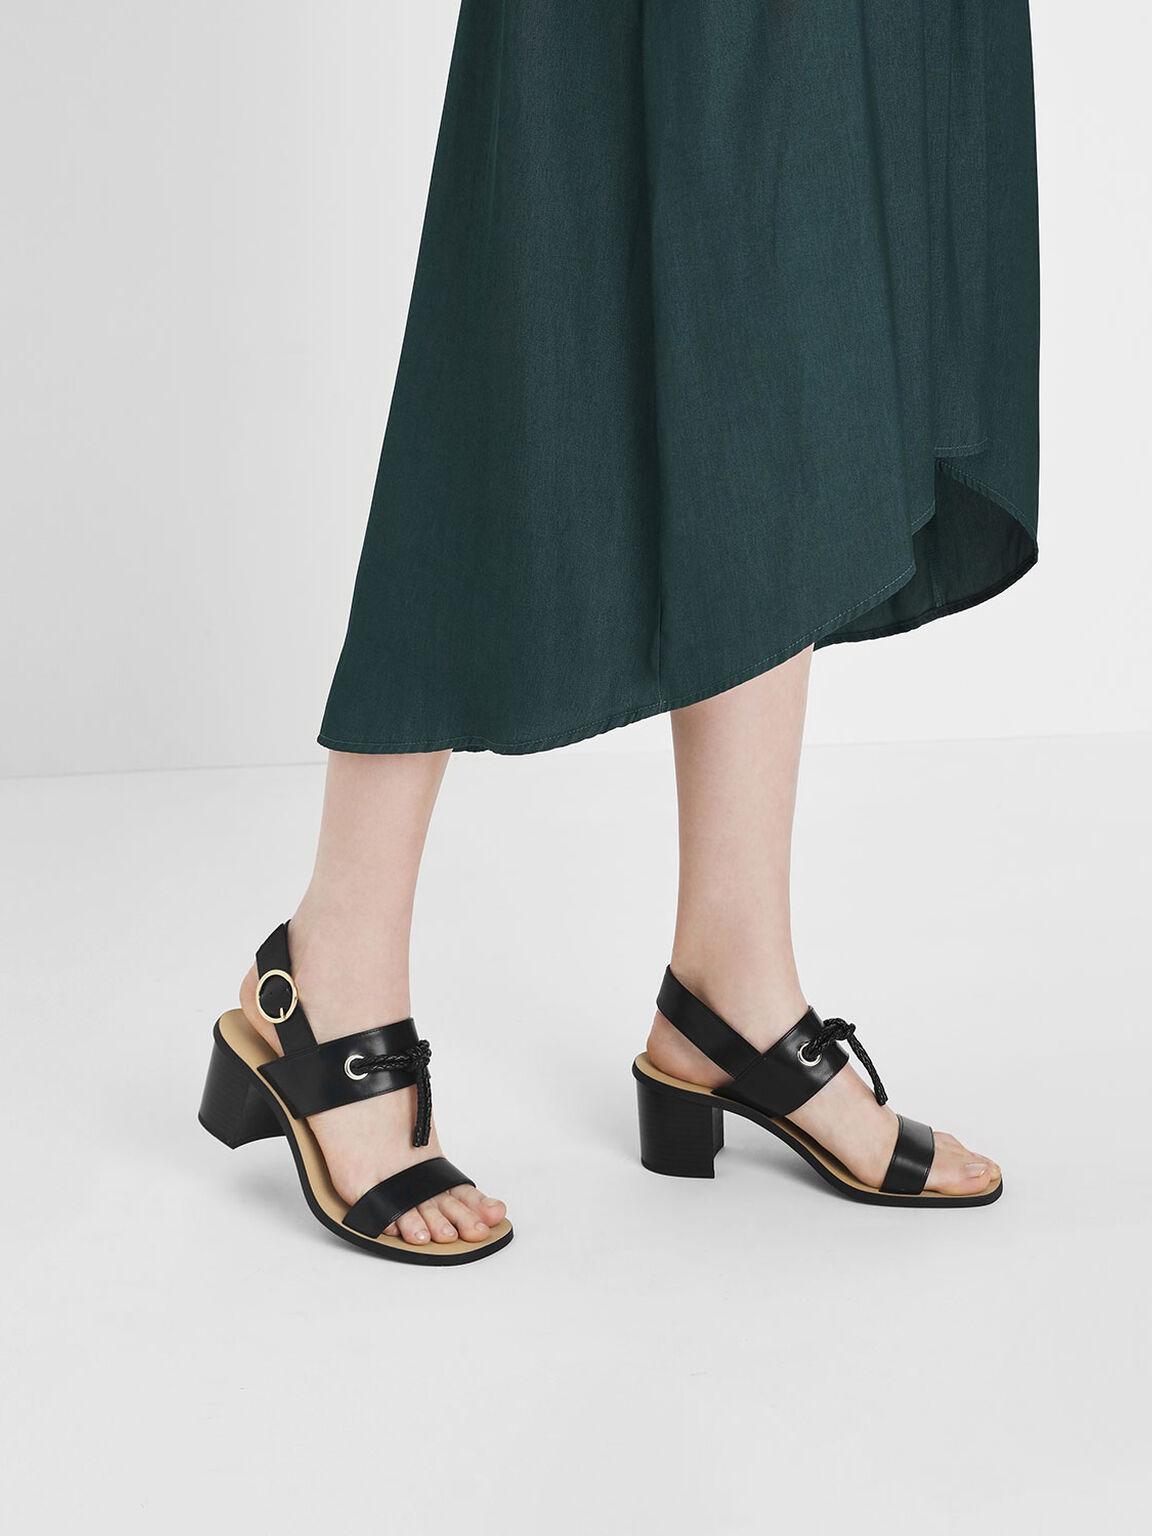 Braided Knot Block Heel Sandals, Black, hi-res